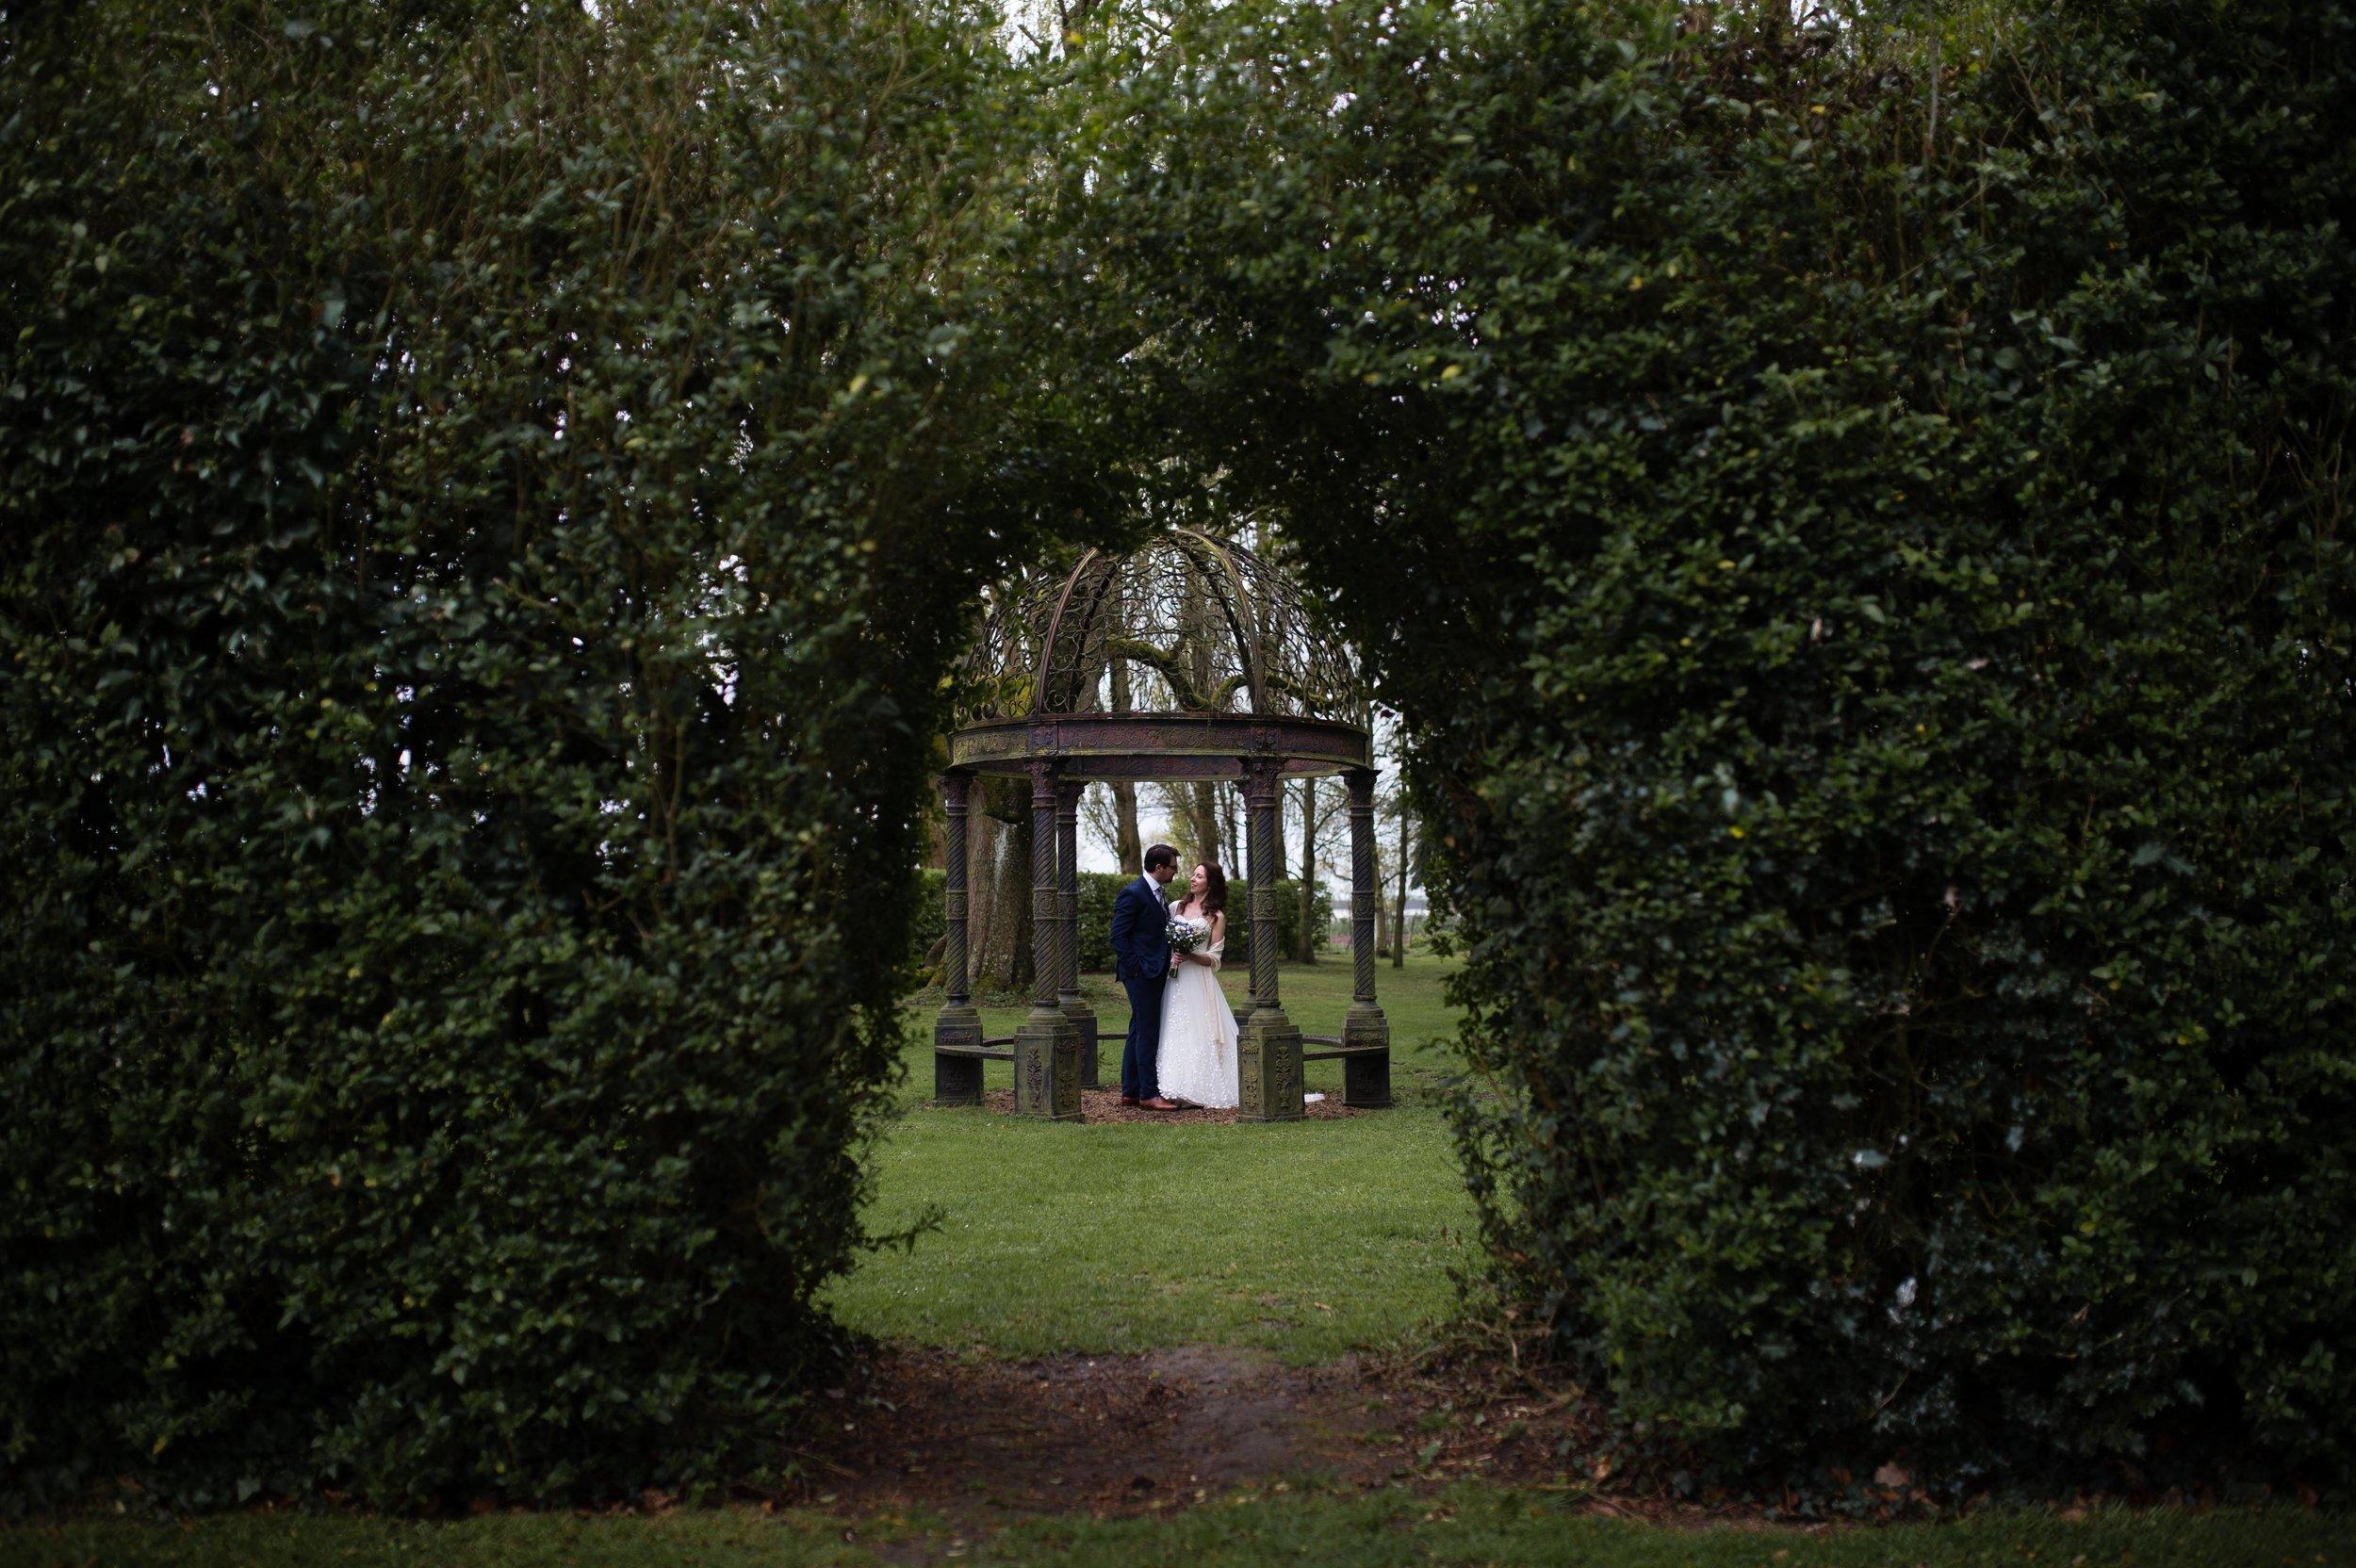 Beechfield house weddings - Abby and Greg (192 of 208).jpg